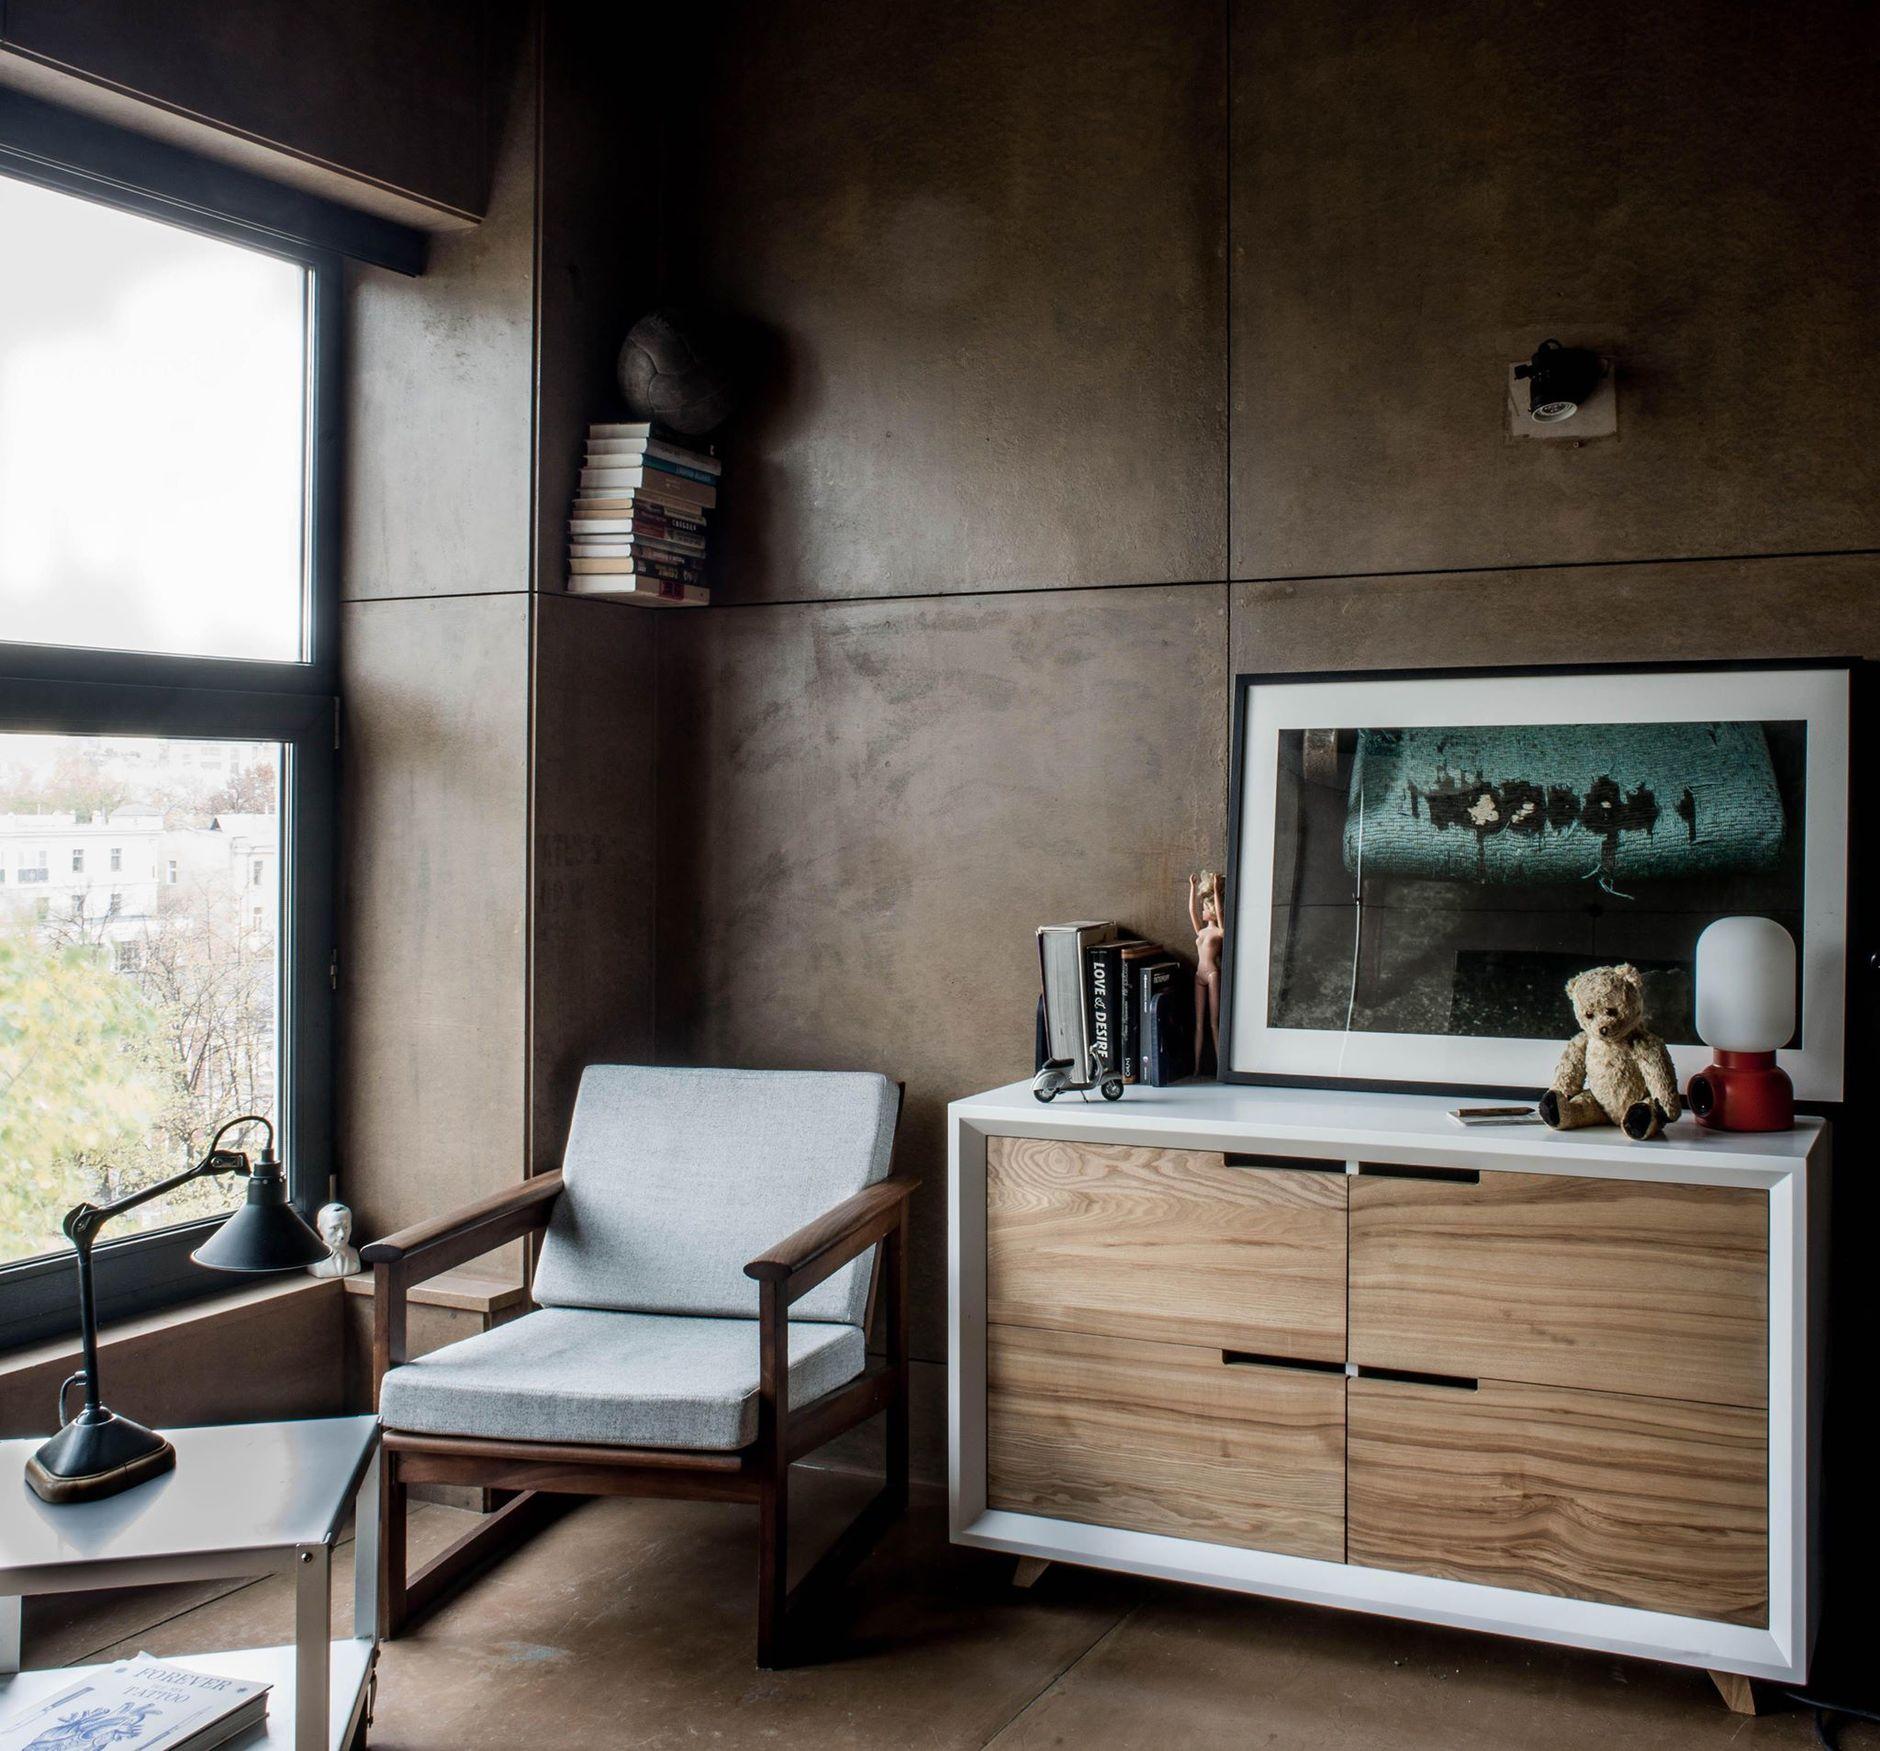 Объект желания. Fineobjects — мебель как искусство (галерея 10, фото 4)